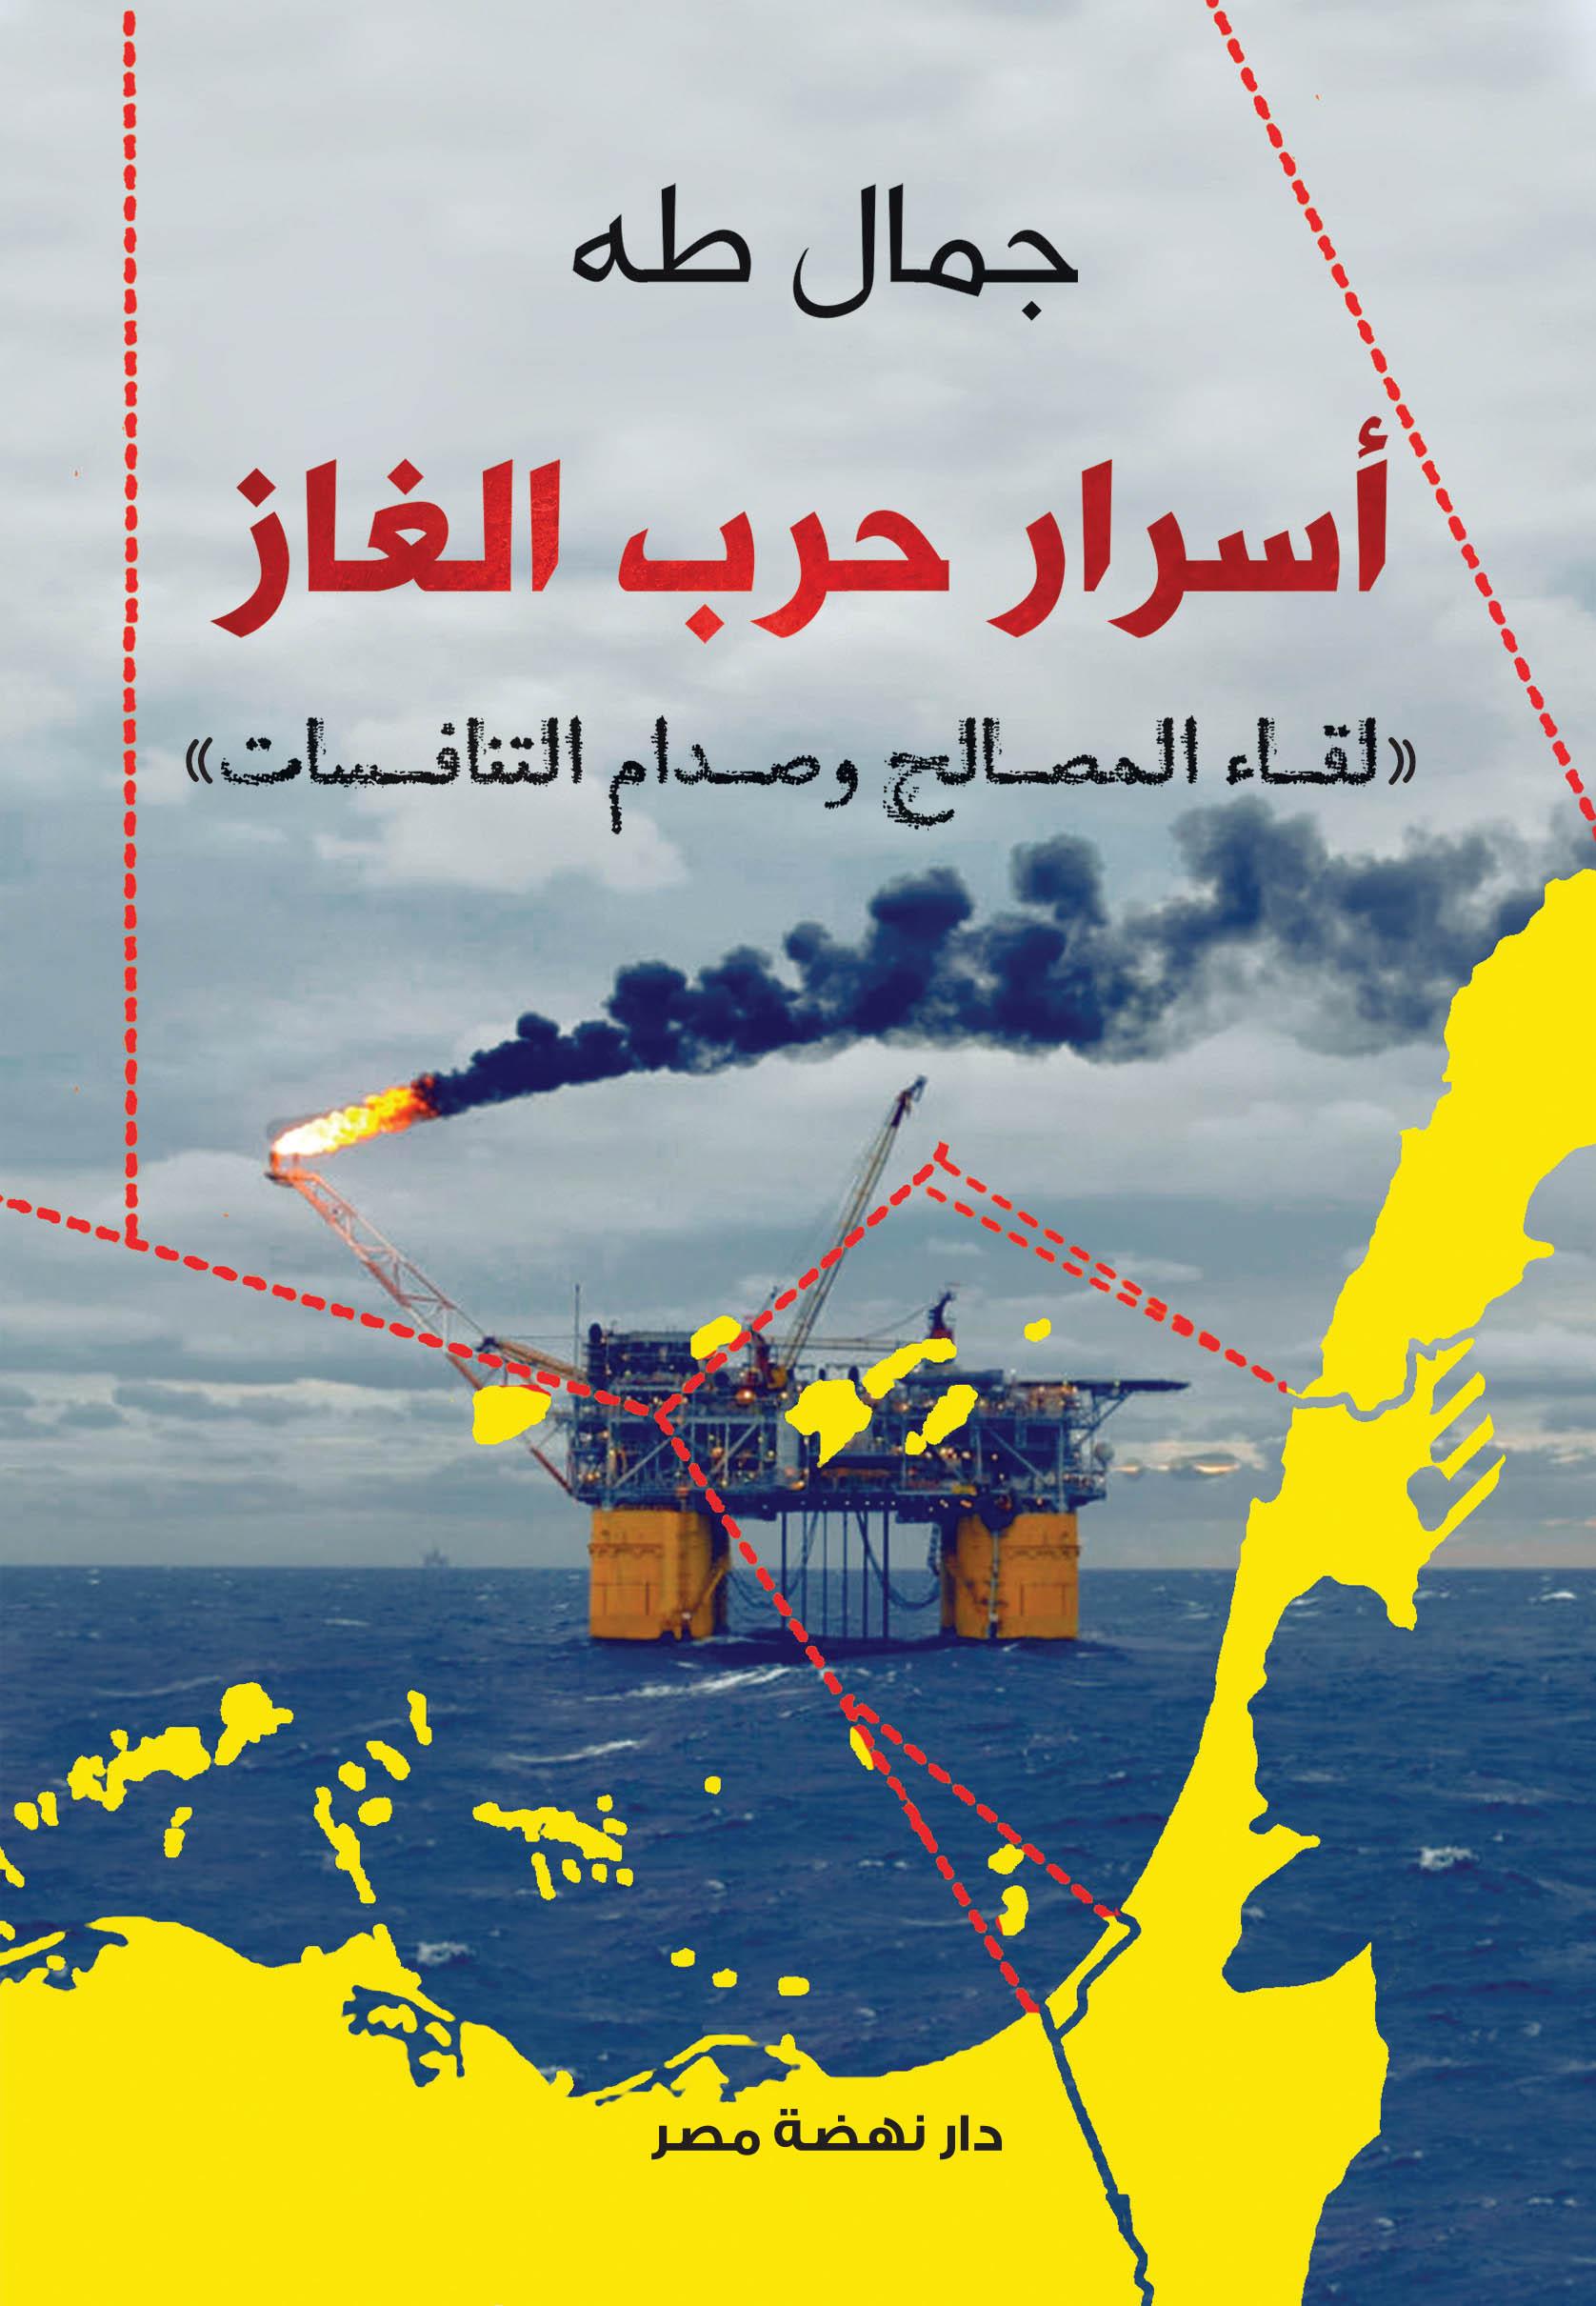 اسرار حرب الغاز